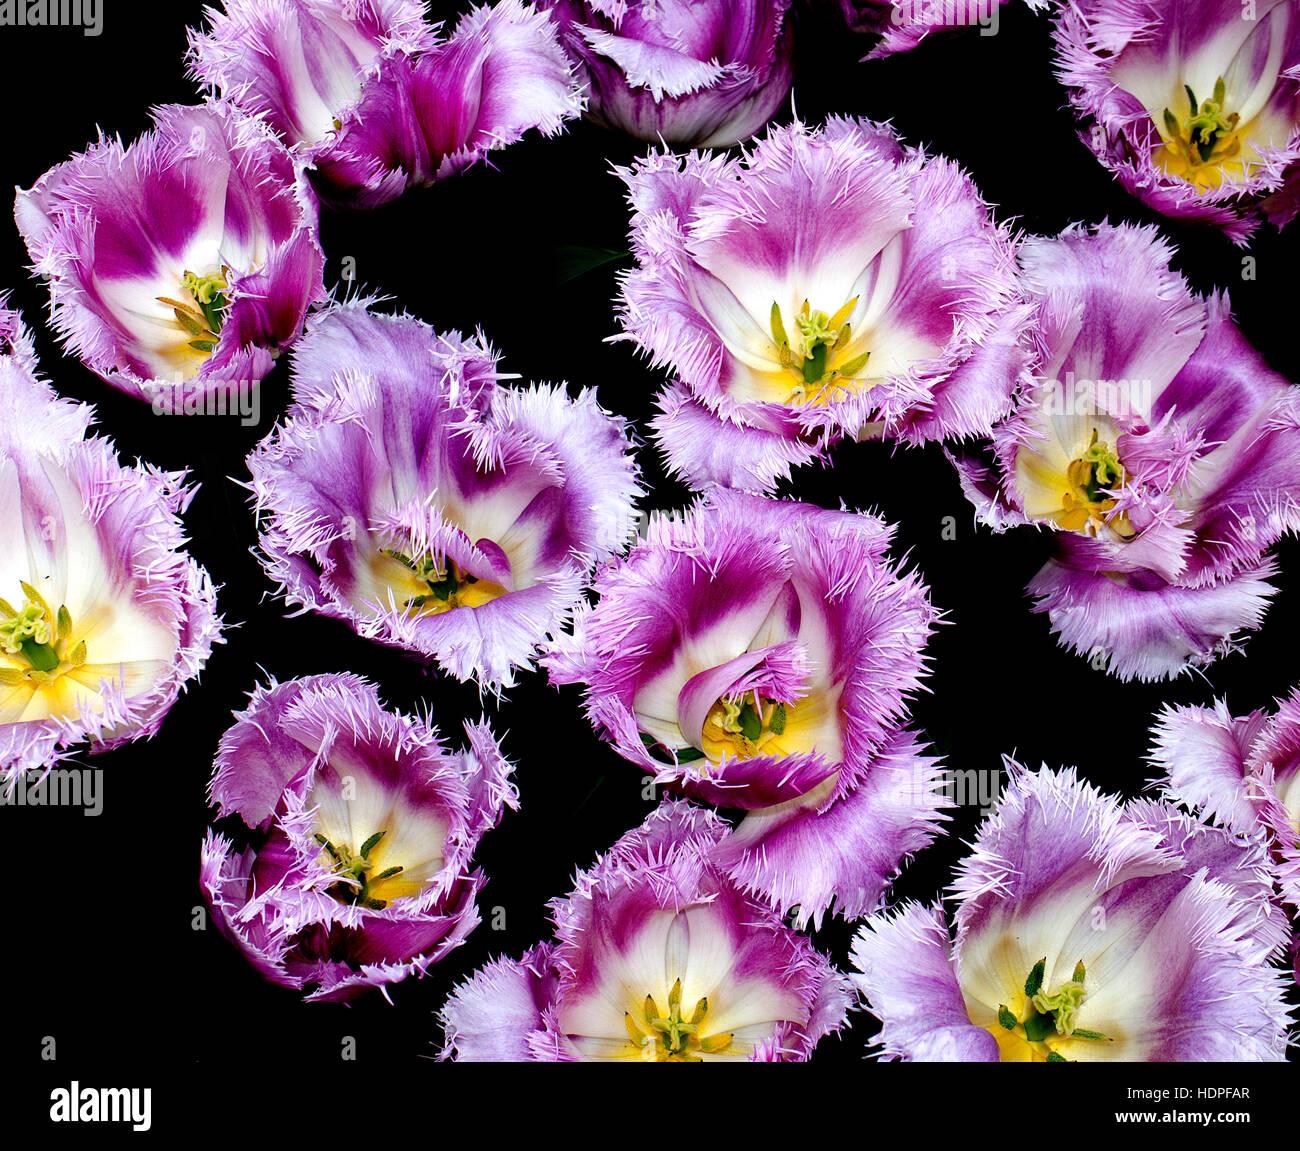 Tulipa 'Oviedo' on display in the Netherlands (digitally enhanced) - Stock Image